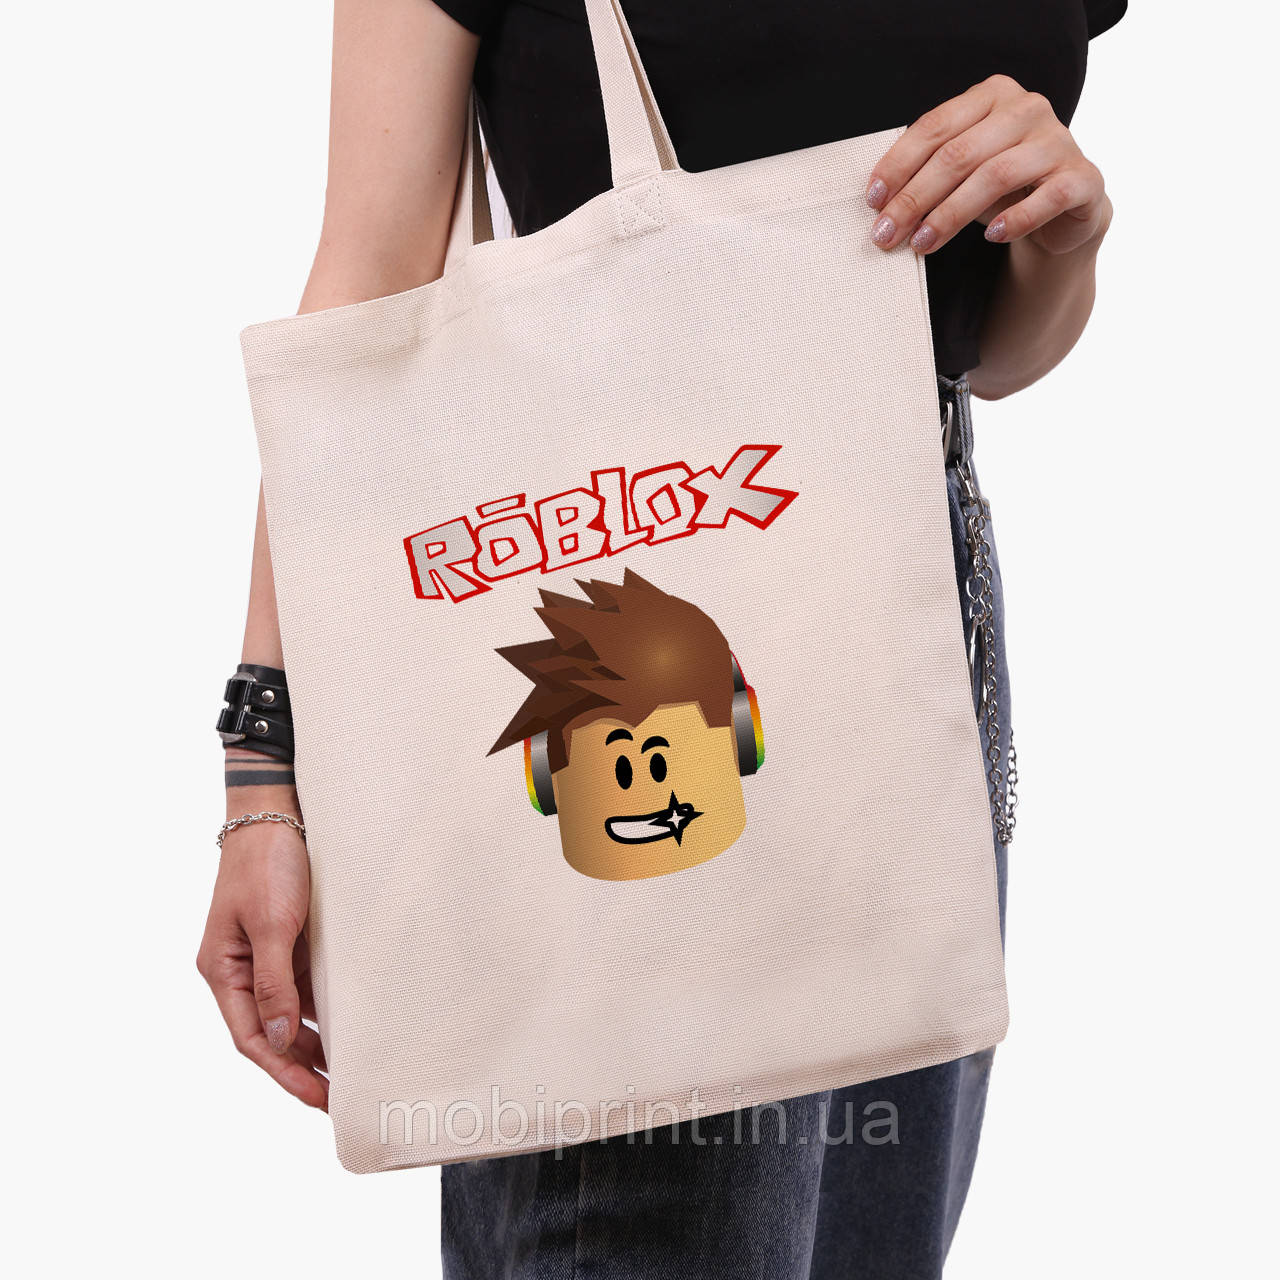 Эко сумка шоппер Роблокс (Roblox) (9227-1713)  экосумка шопер 41*35 см